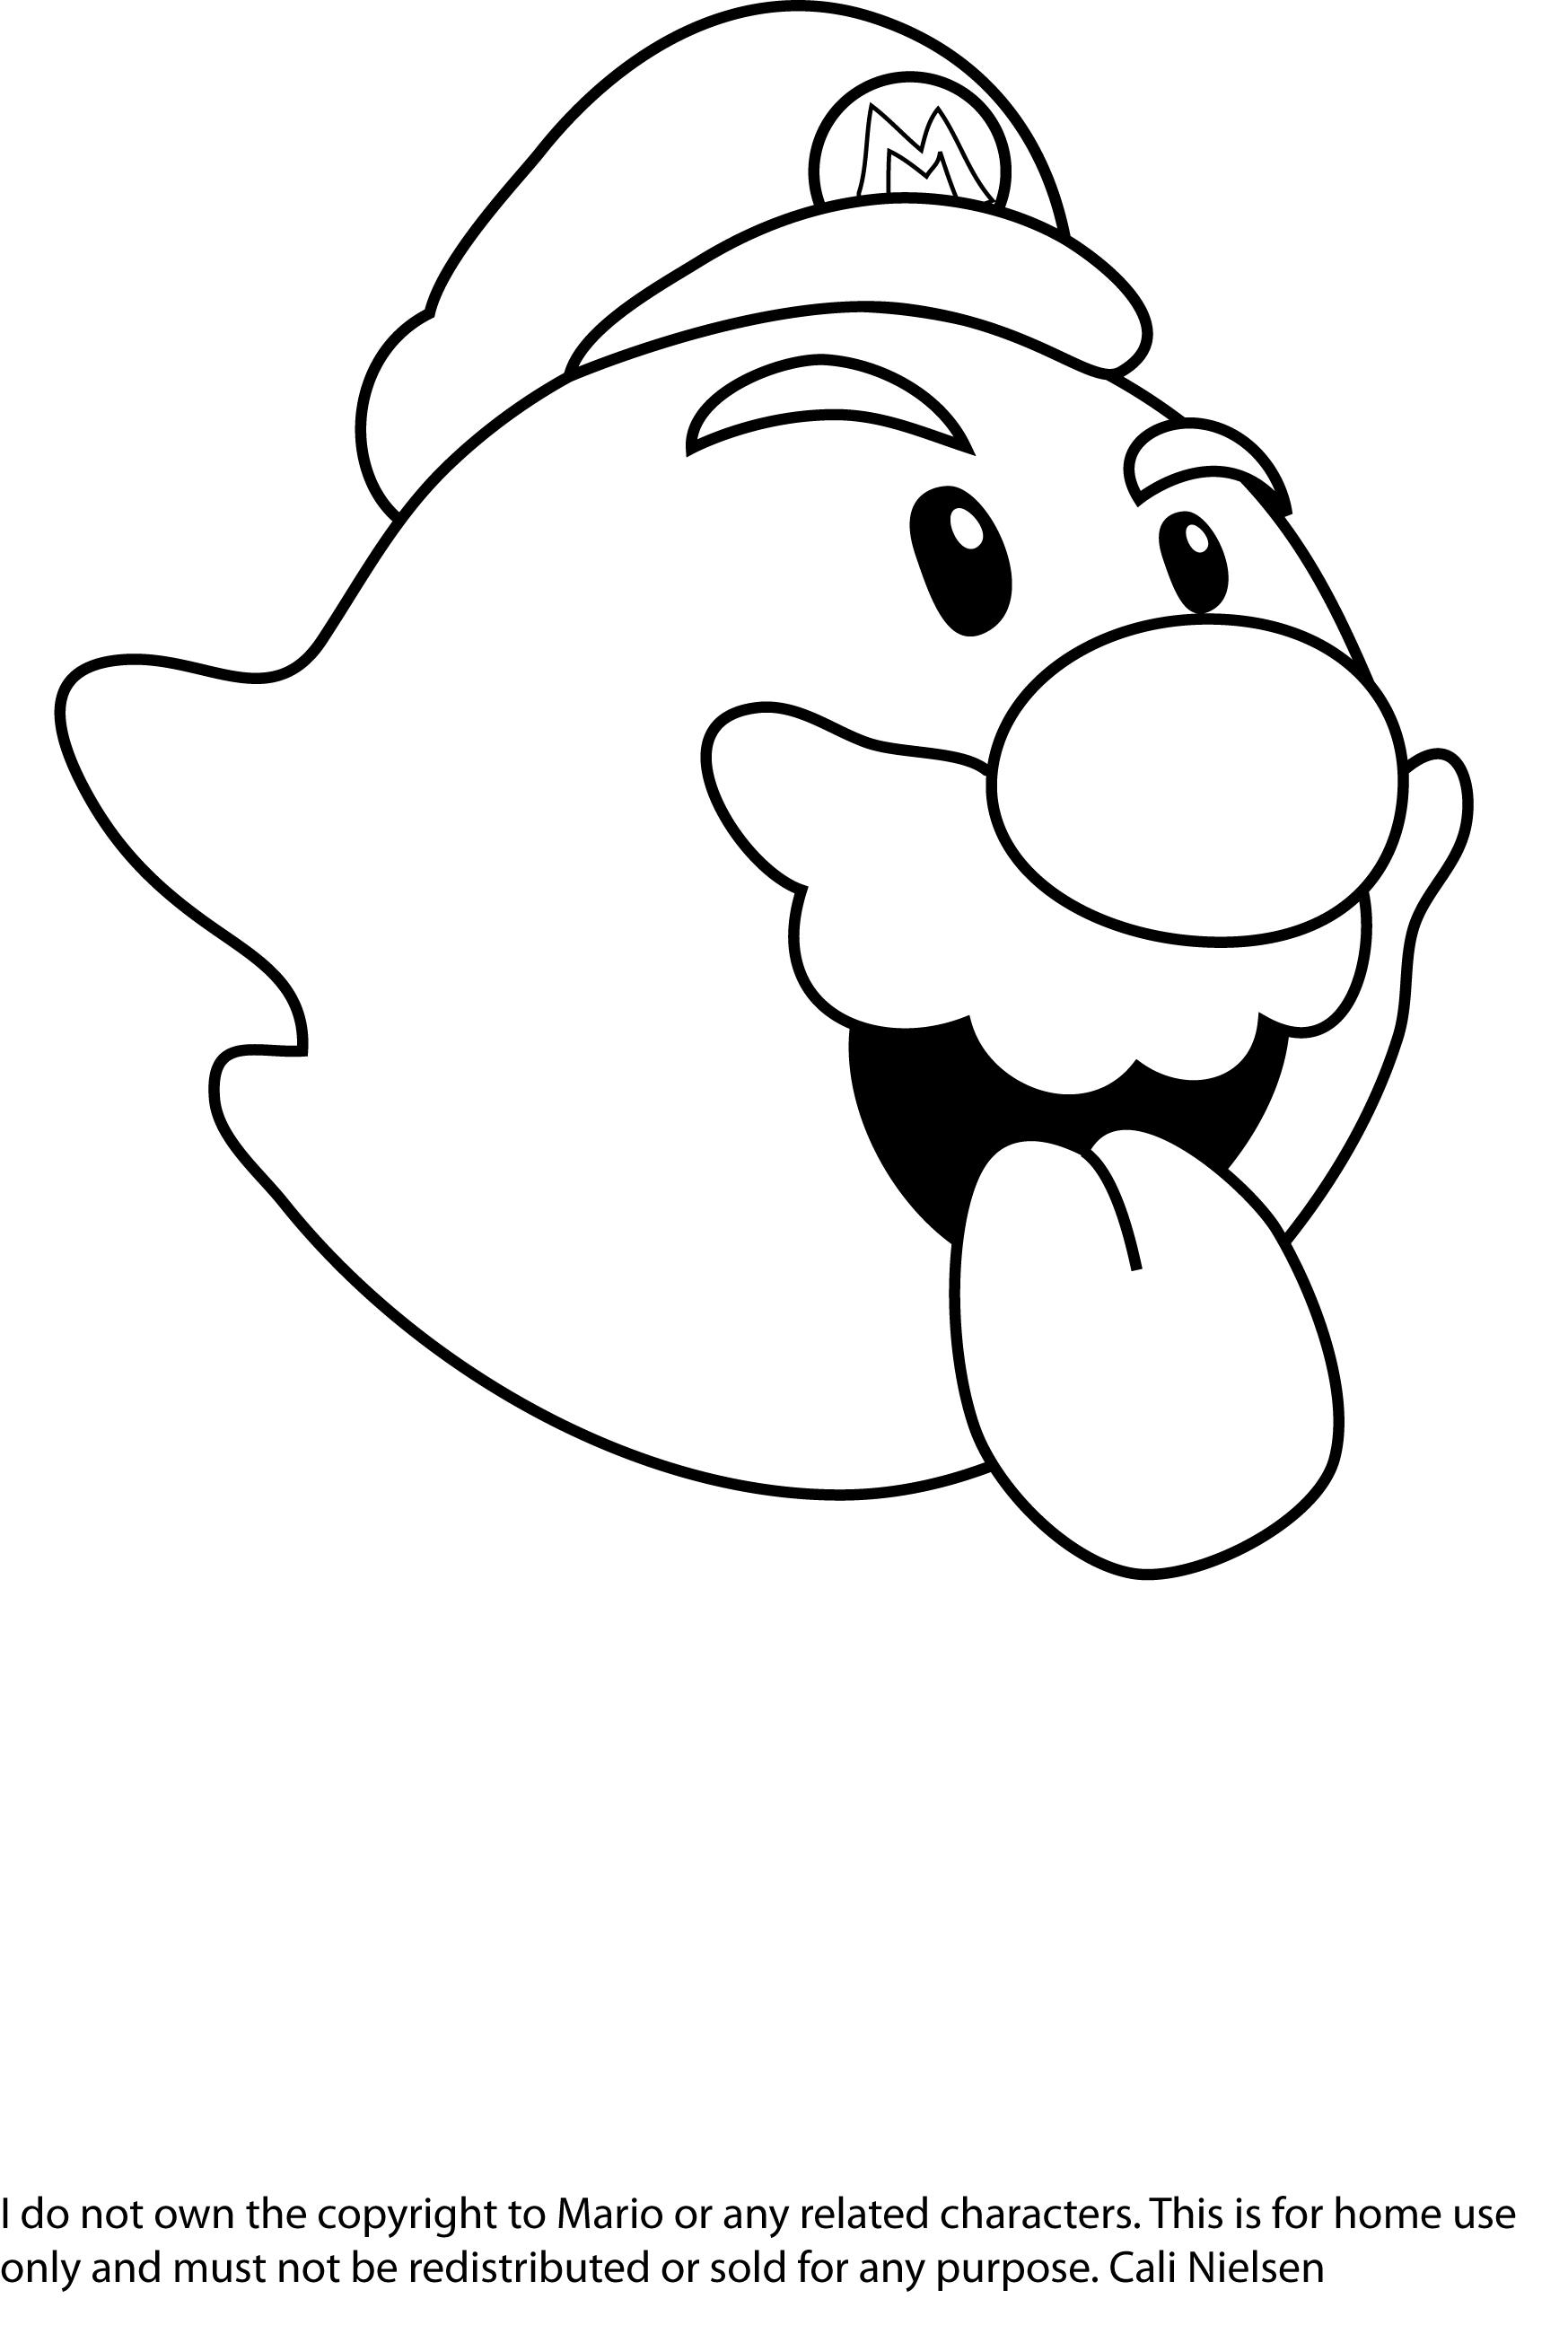 Impressionnant Dessin A Imprimer Gratuit Mario